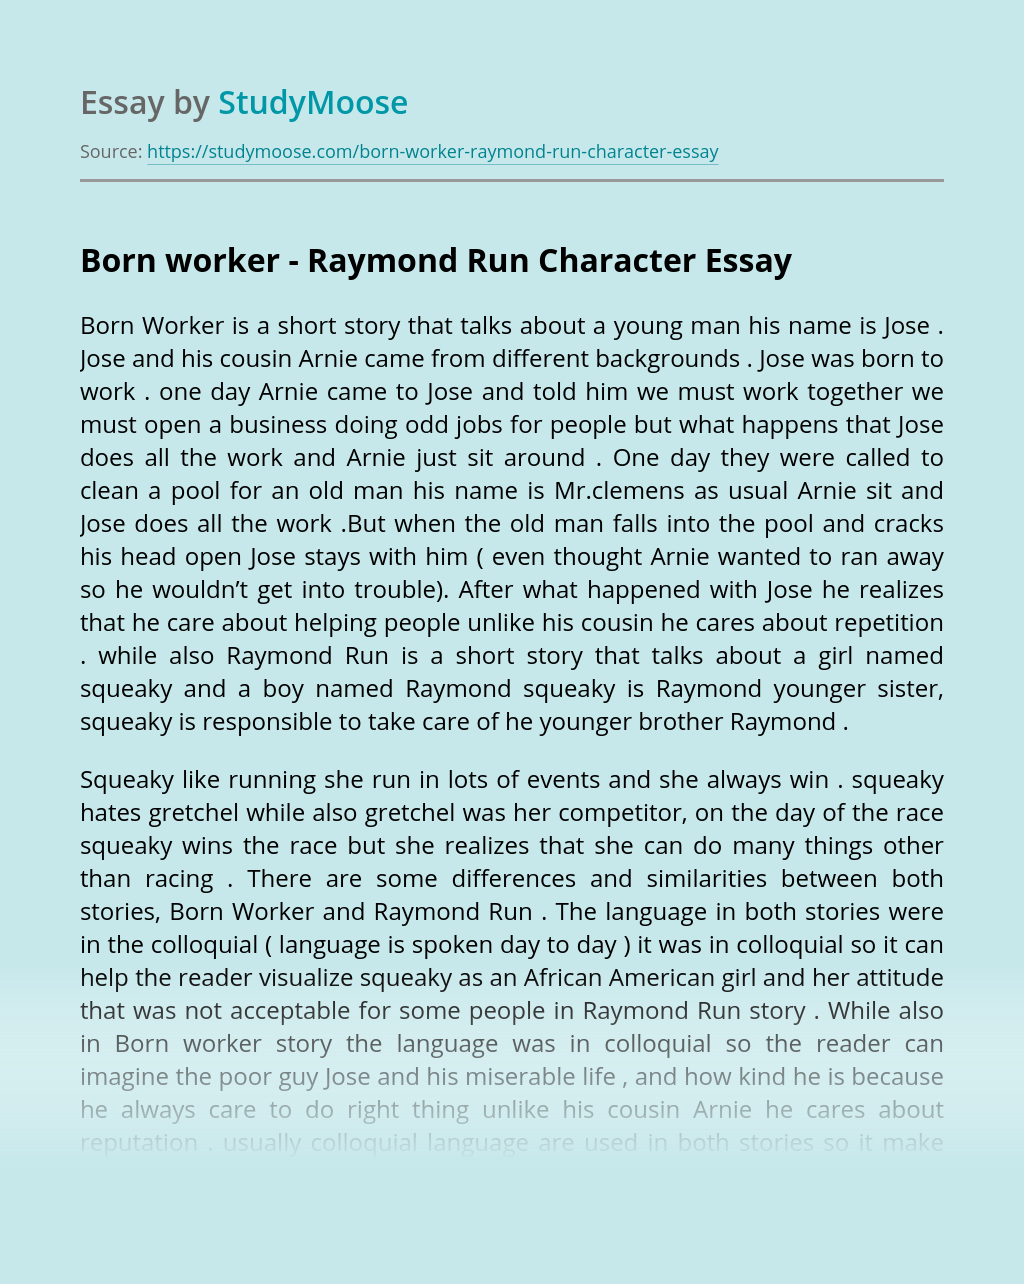 Born worker - Raymond Run Character